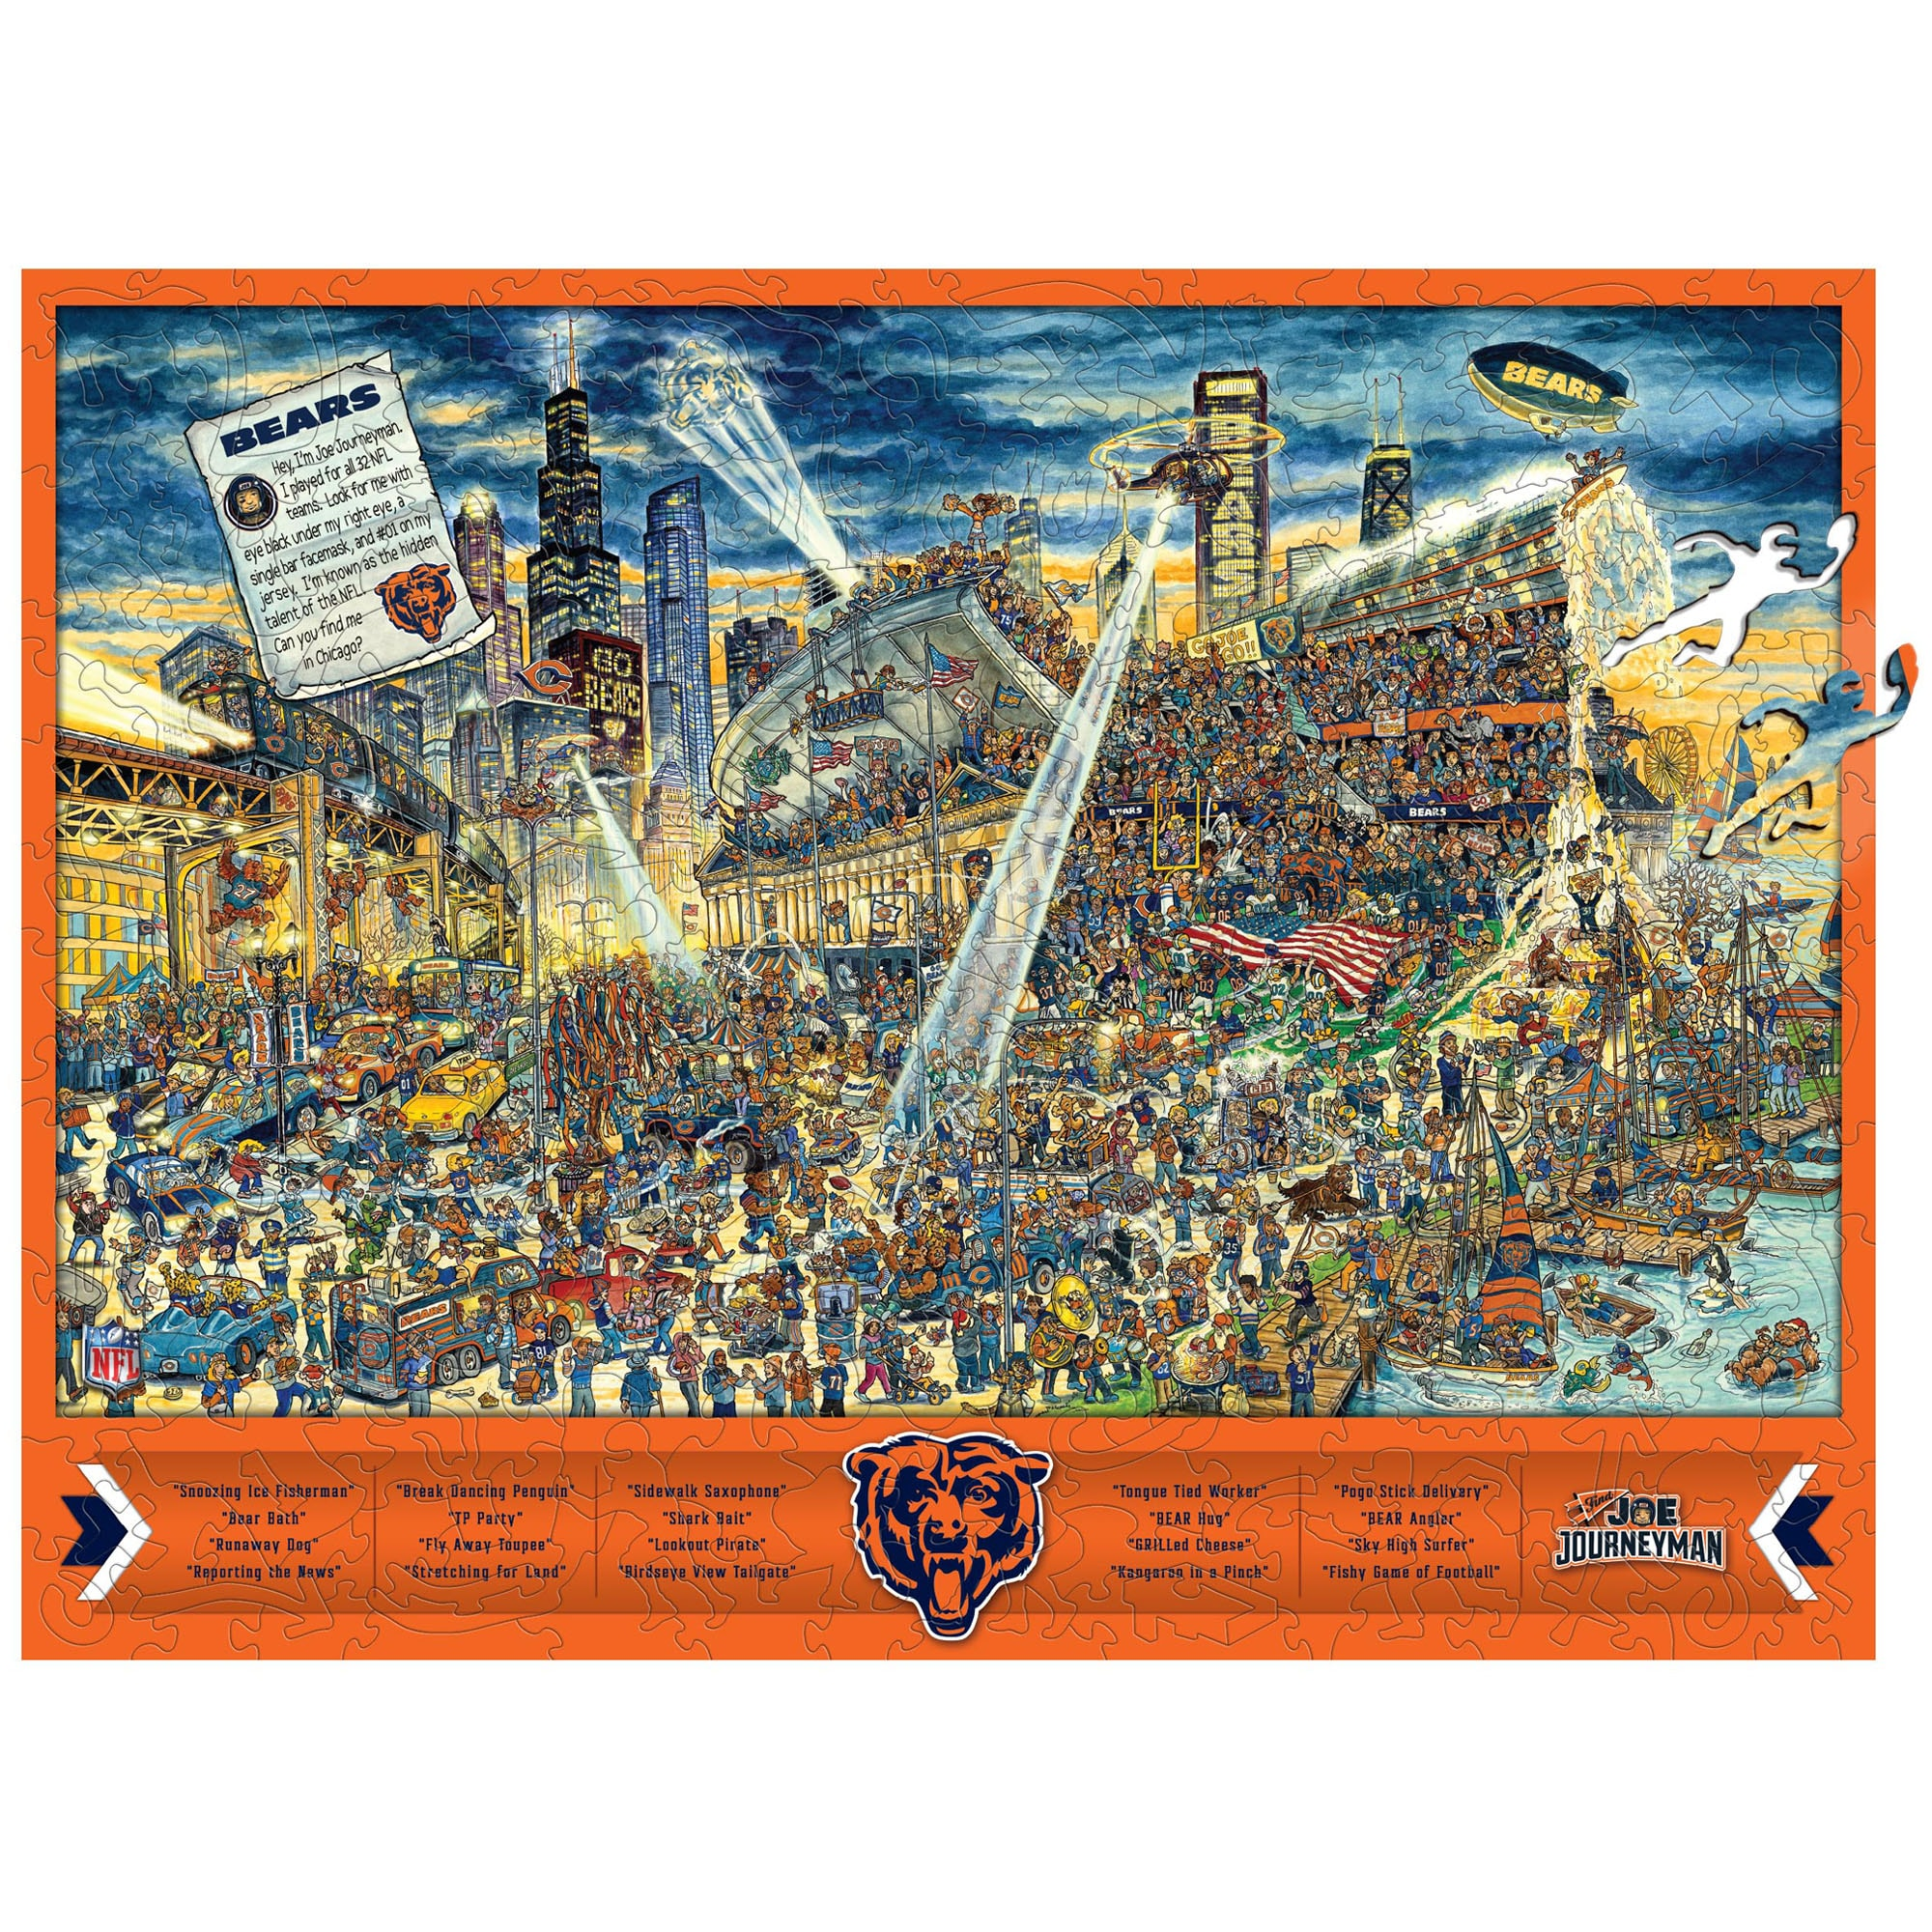 Chicago Bears Wooden Joe Journeyman Puzzle